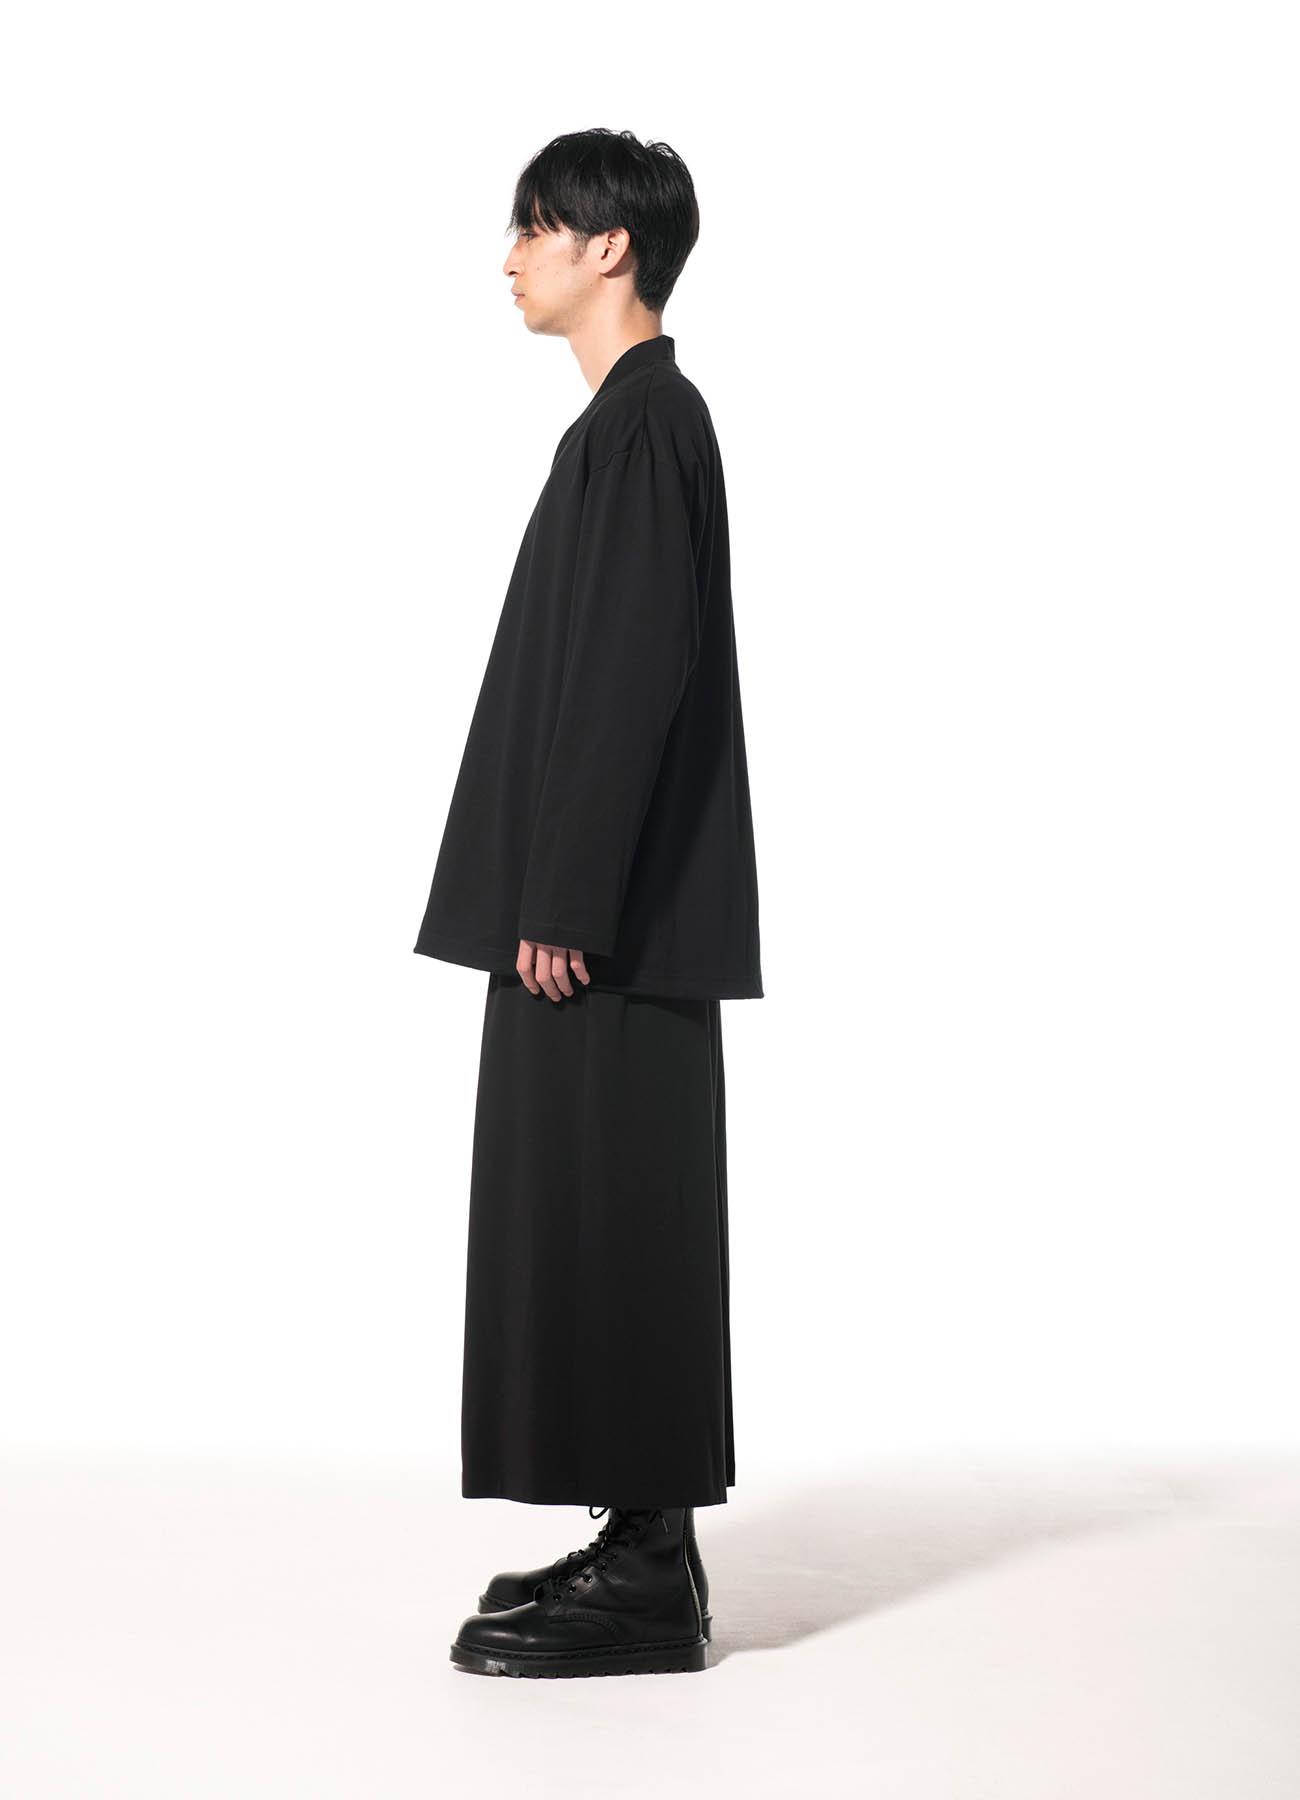 40/2 Cotton Jersey Kimono Layered Drawstring Pullover